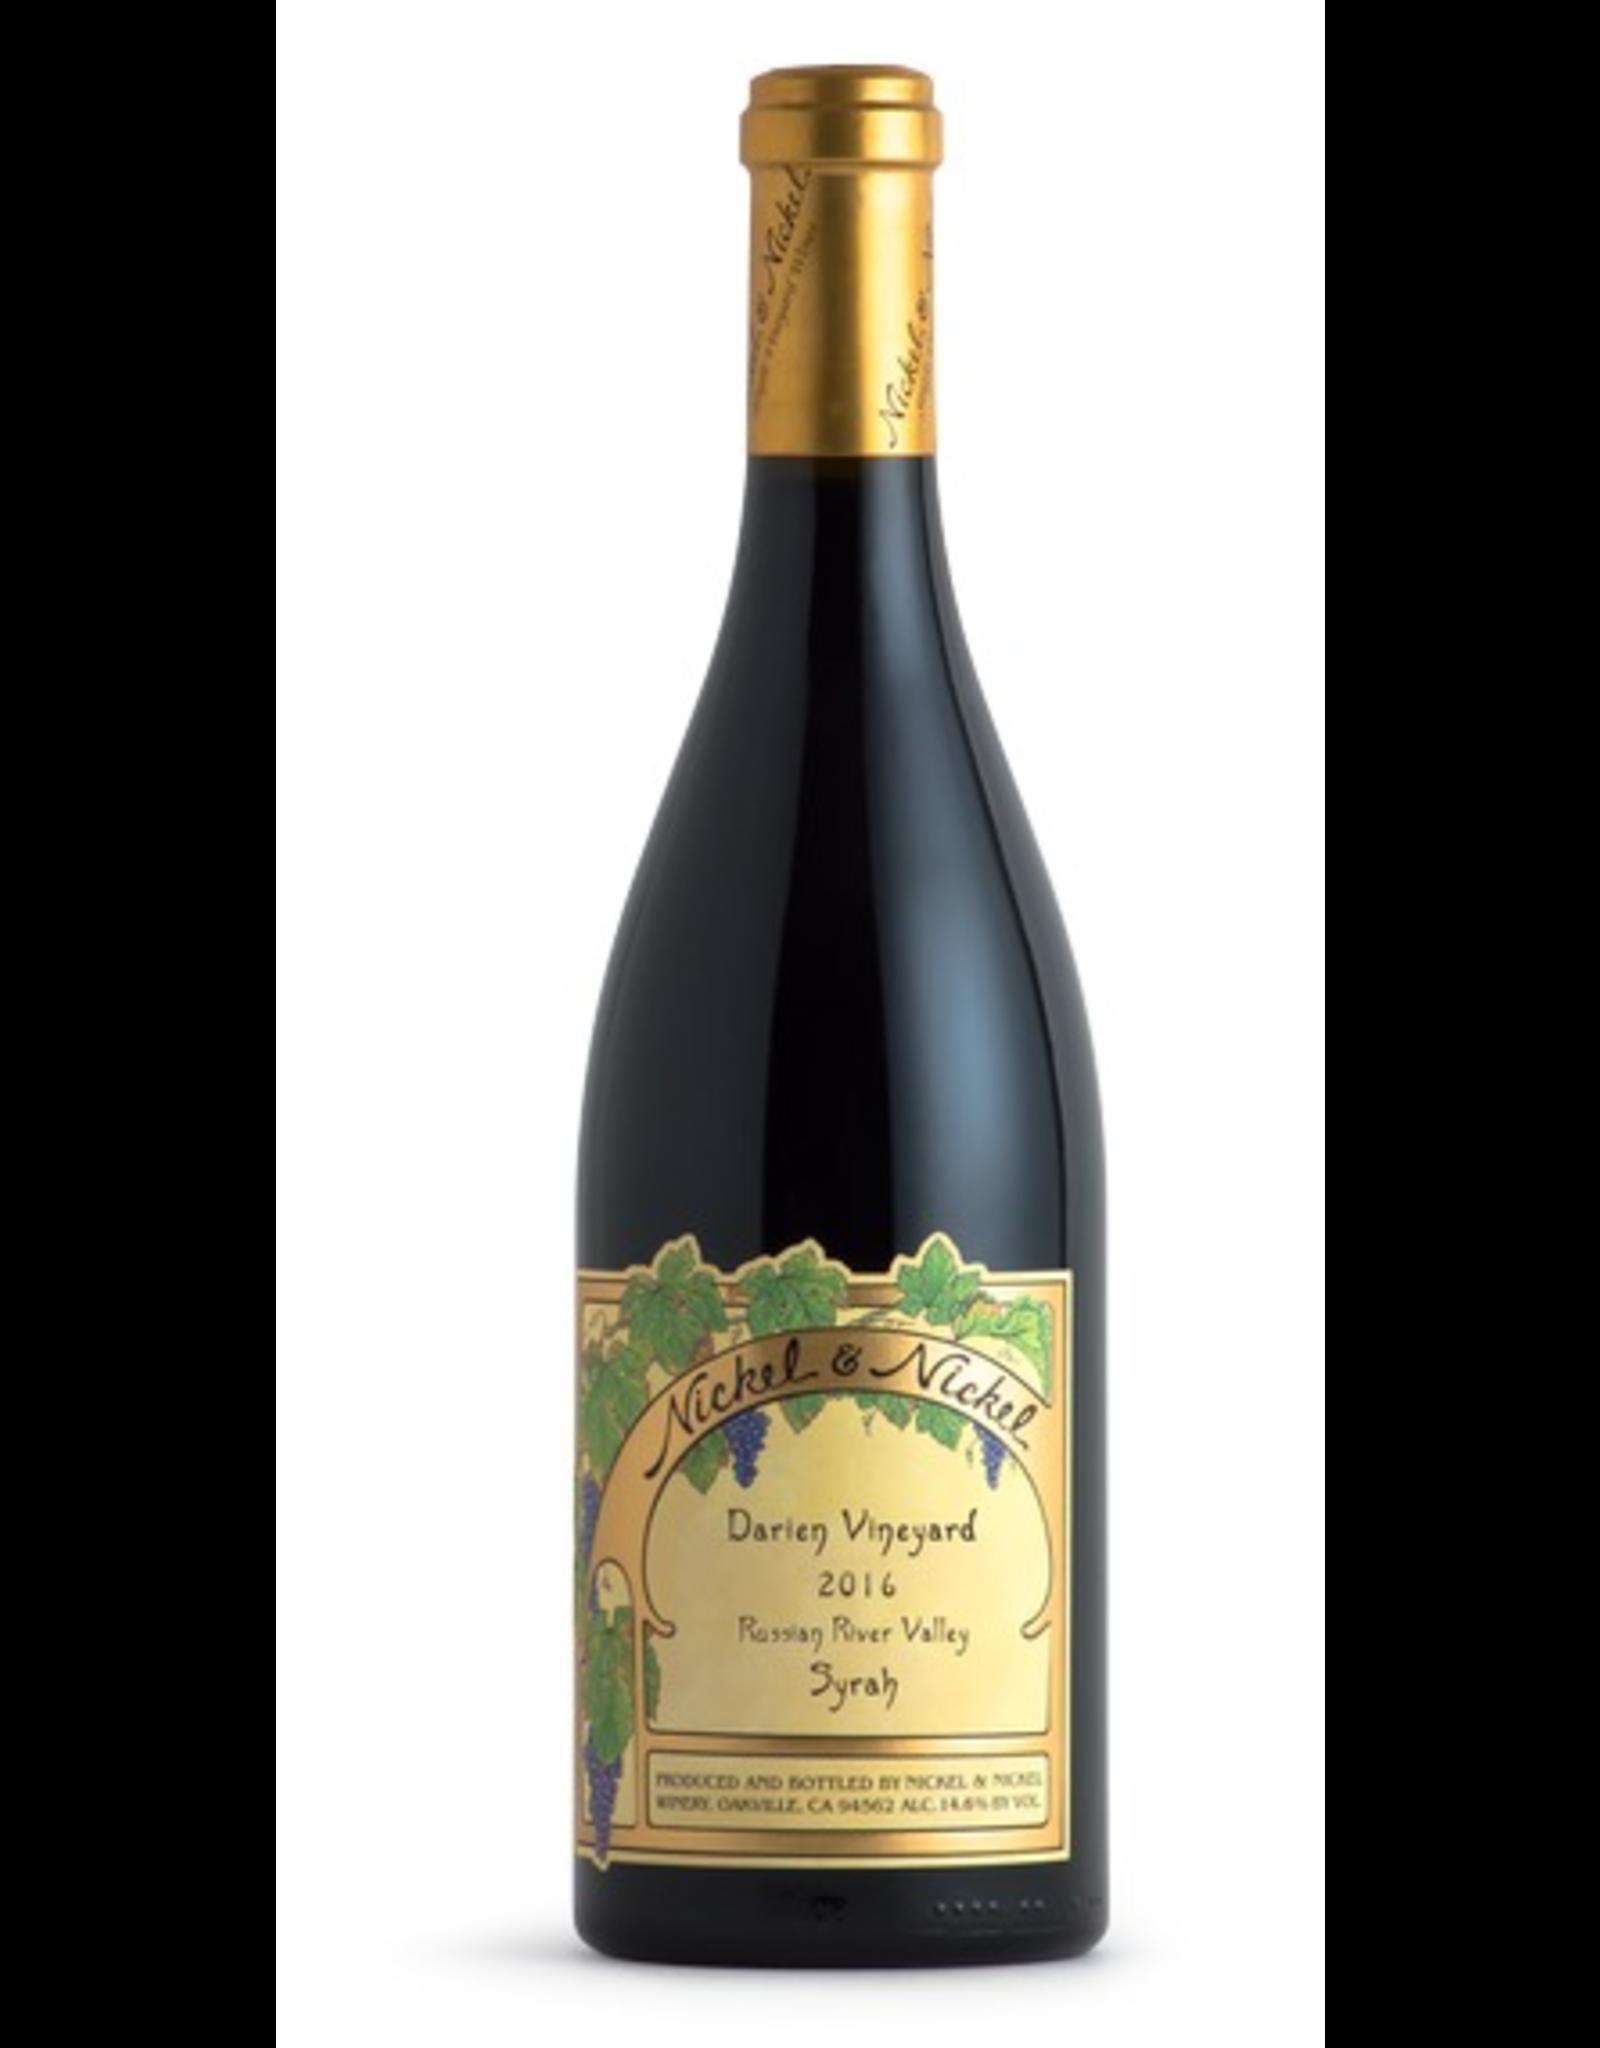 Red Wine 2016, Nickel & Nickel Darien Vineyard, Syrah, Russian River Valley, Sonoma County, California, 14.7% Alc, CT87.8